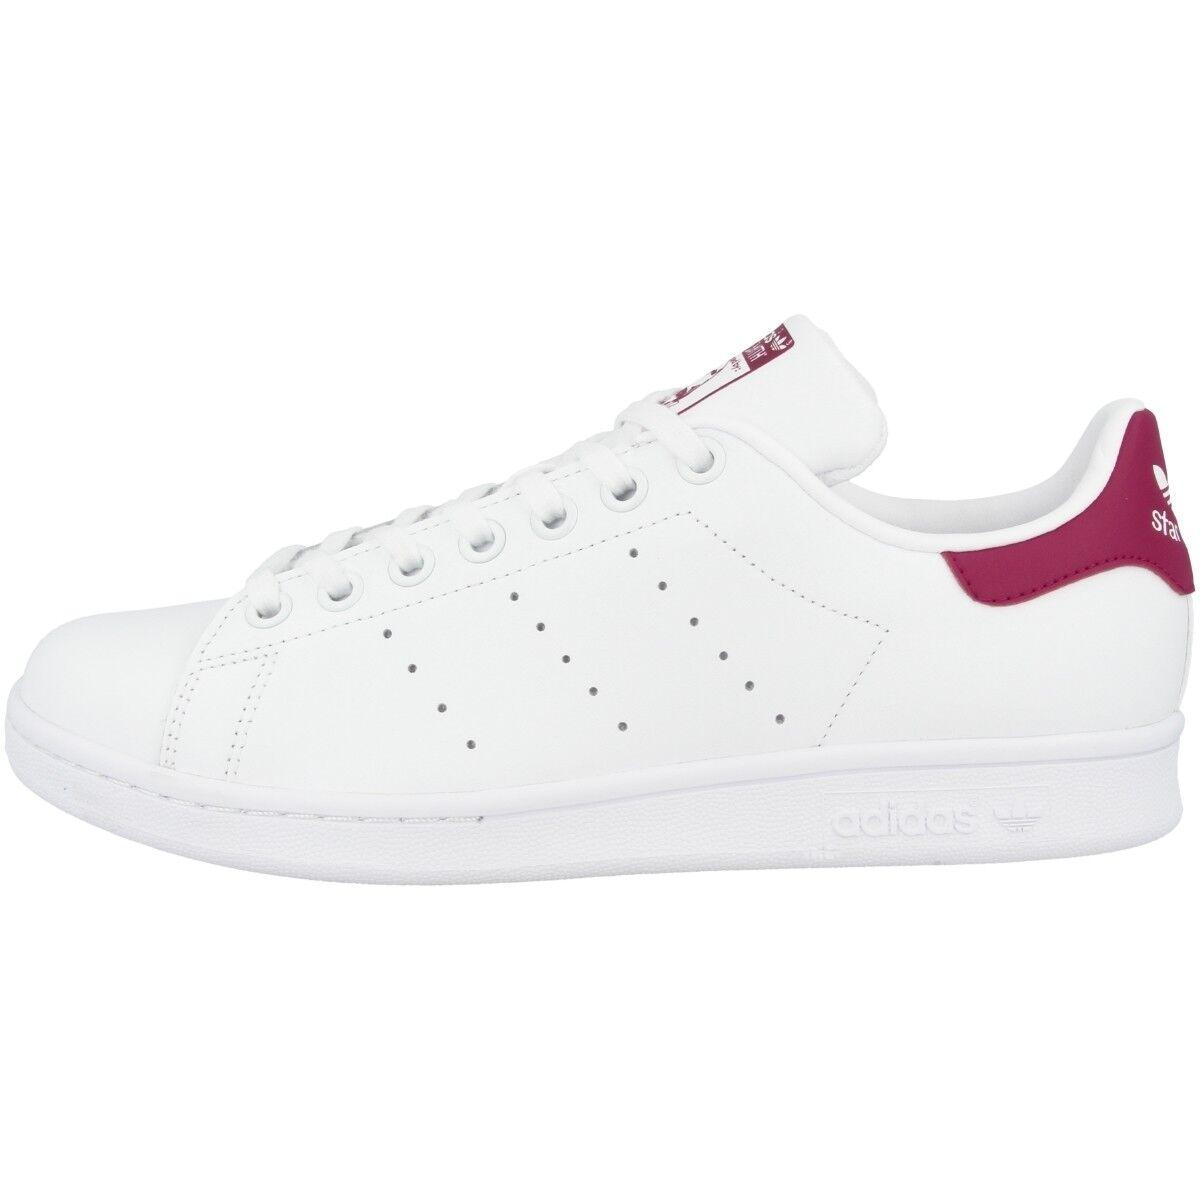 Adidas Stan Stan Stan Smith J zapatos retro cortos blanco rosado b32703 Superstar gacela  directo de fábrica